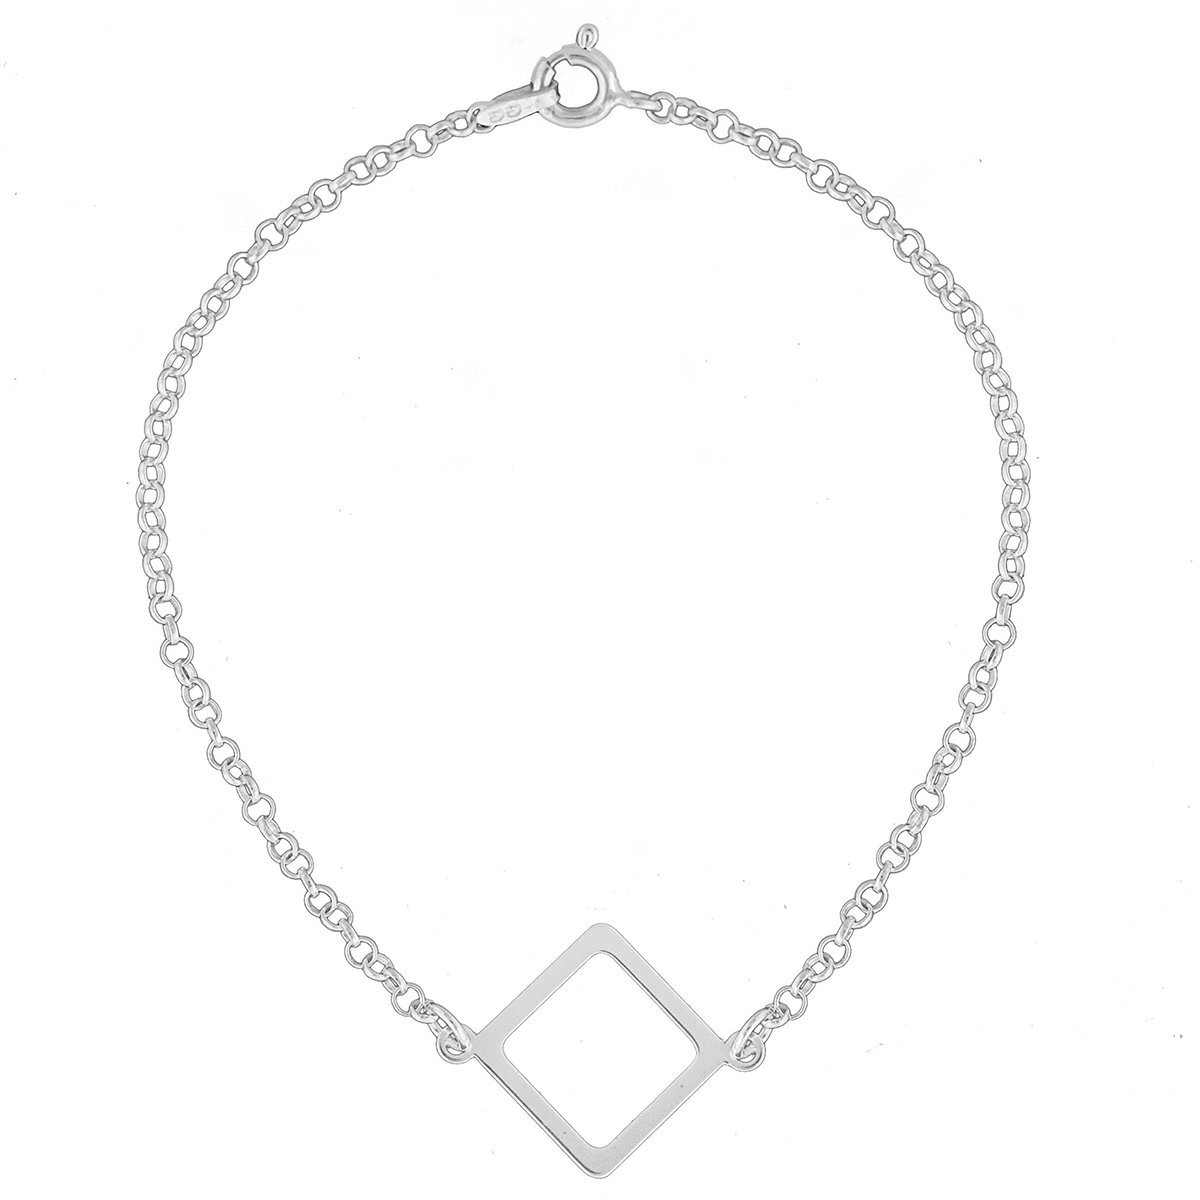 Pulseira Feminina 18cm Forma Geométrica Losango De Prata 925